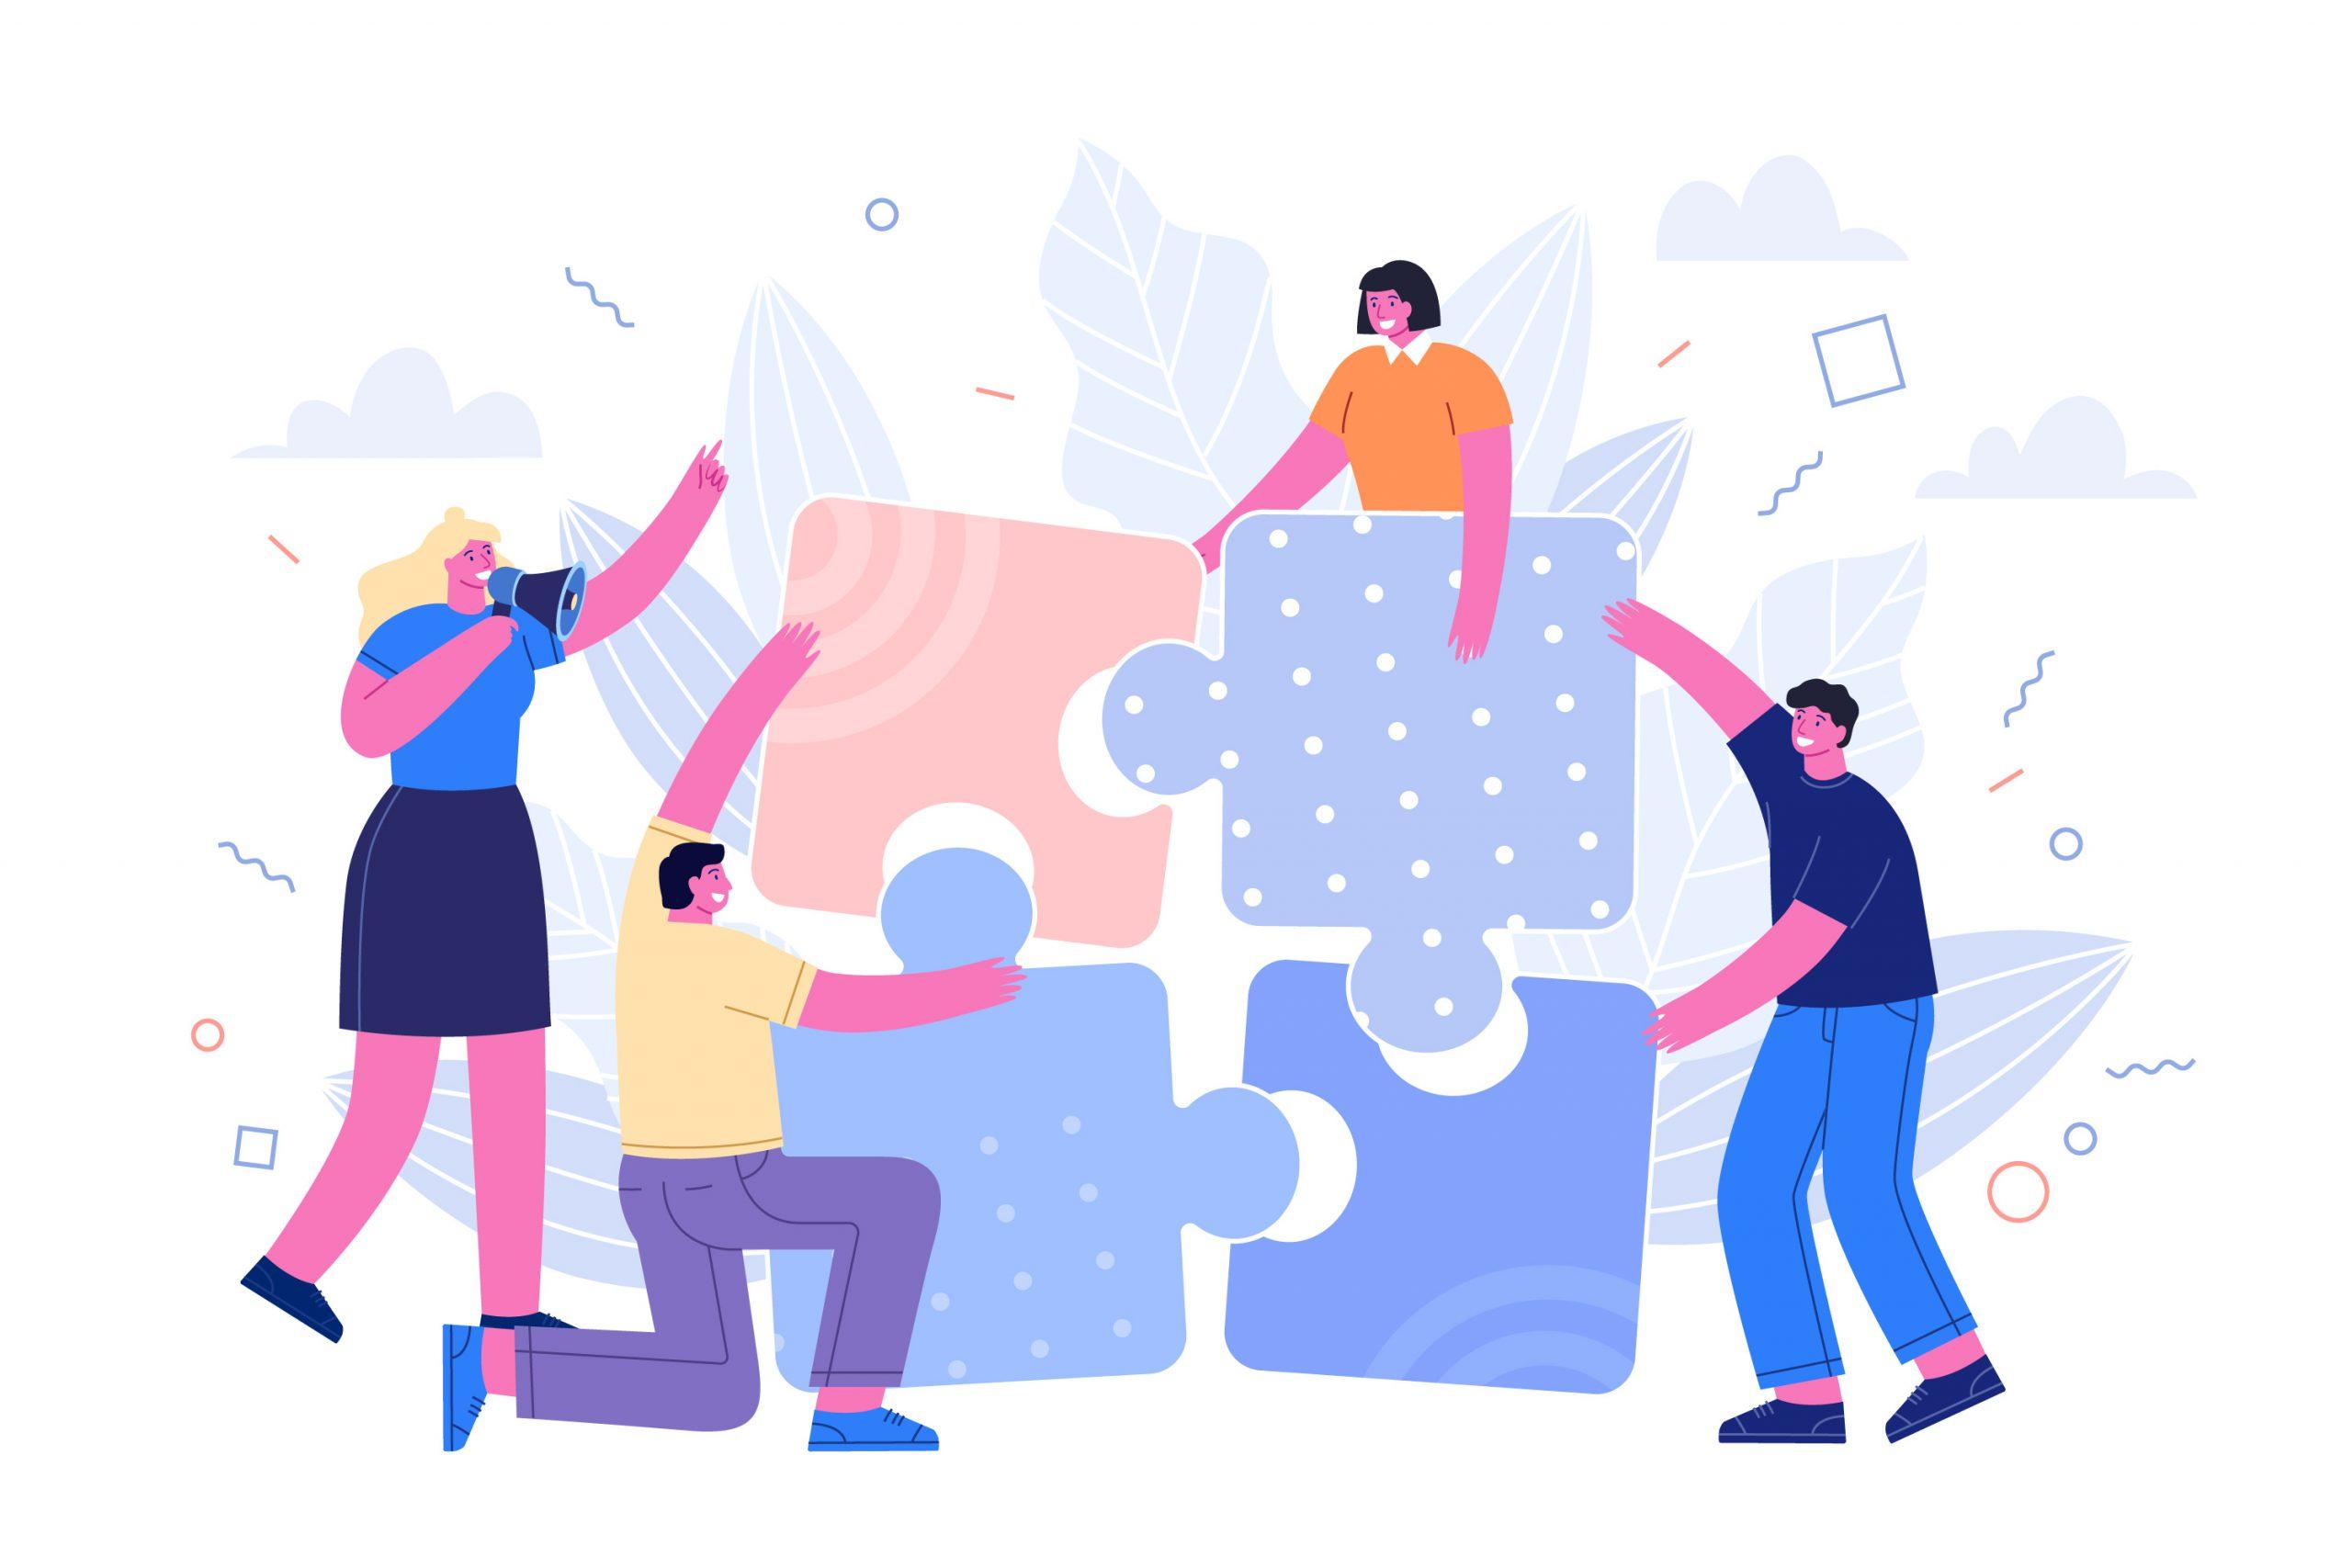 Interactive Event Participation